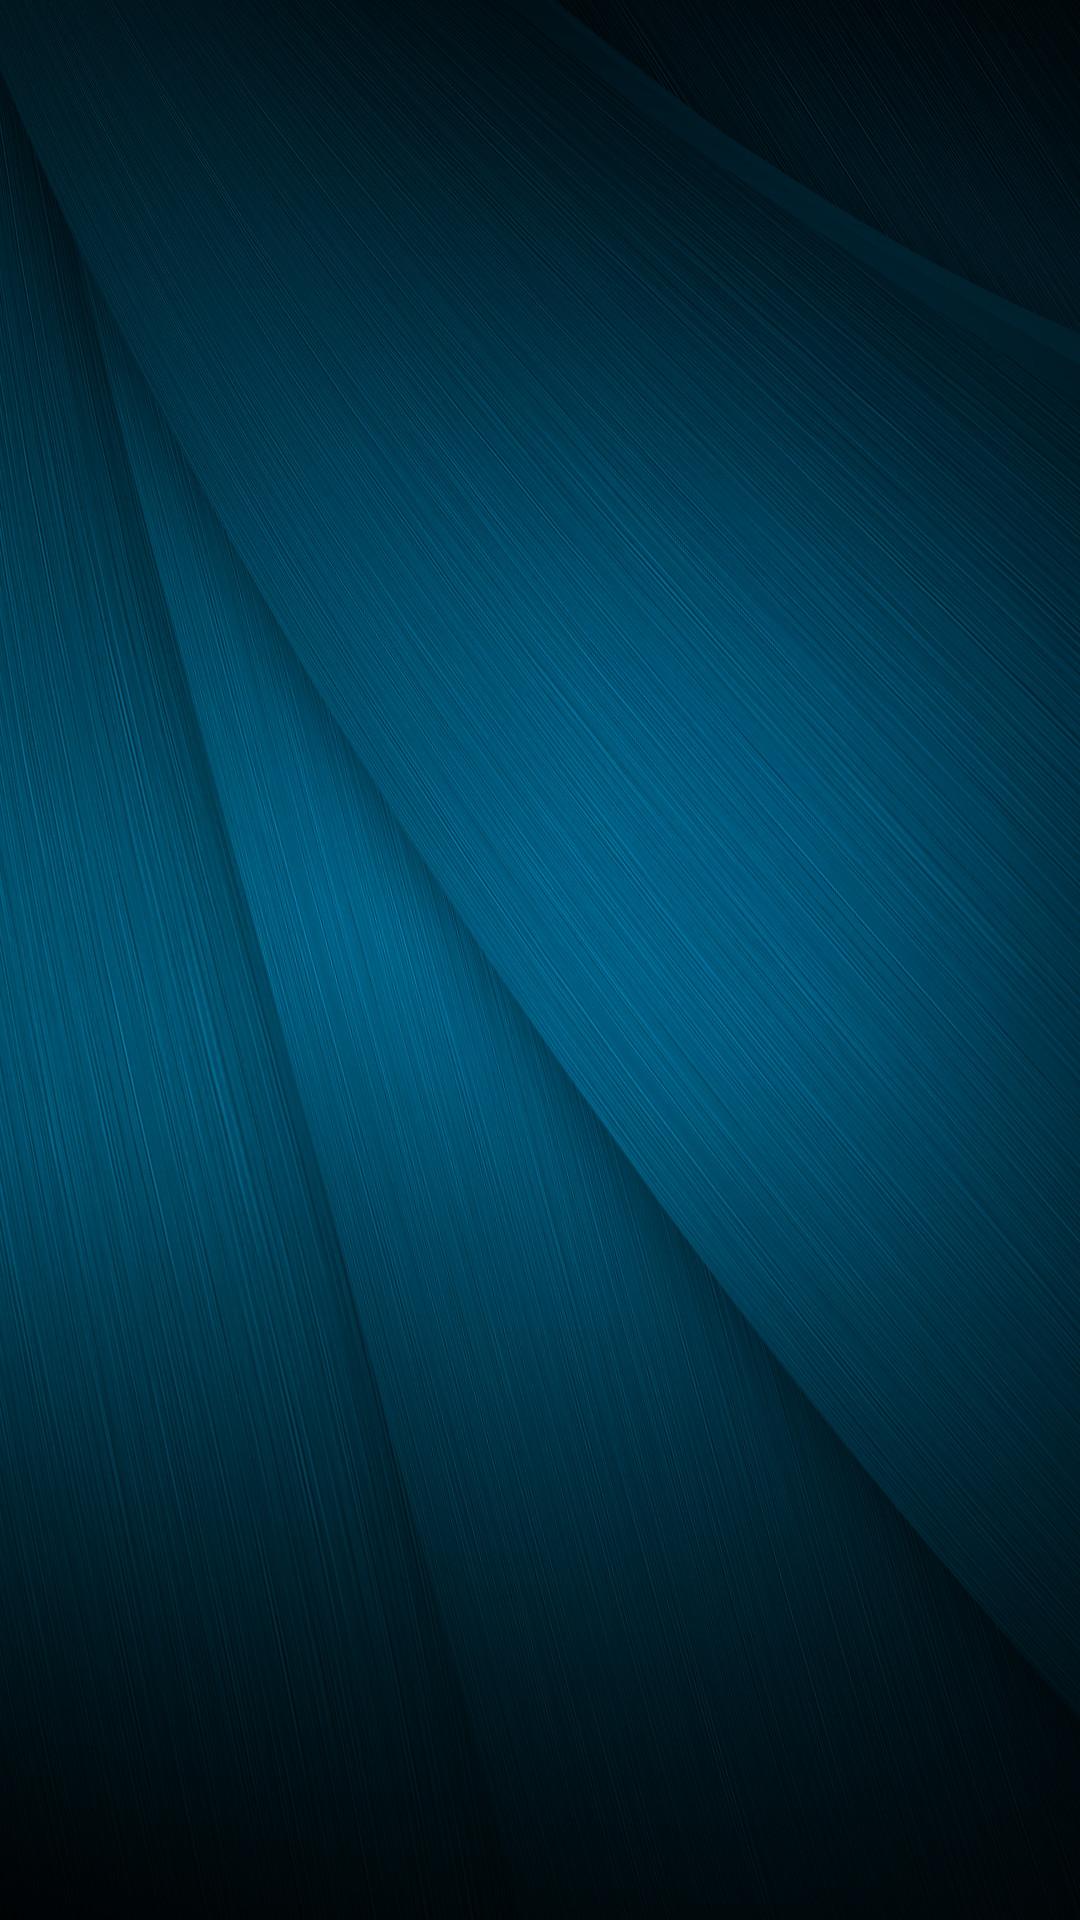 vivo_x7_wallpapers vivo_x7_wallpapers-001 …